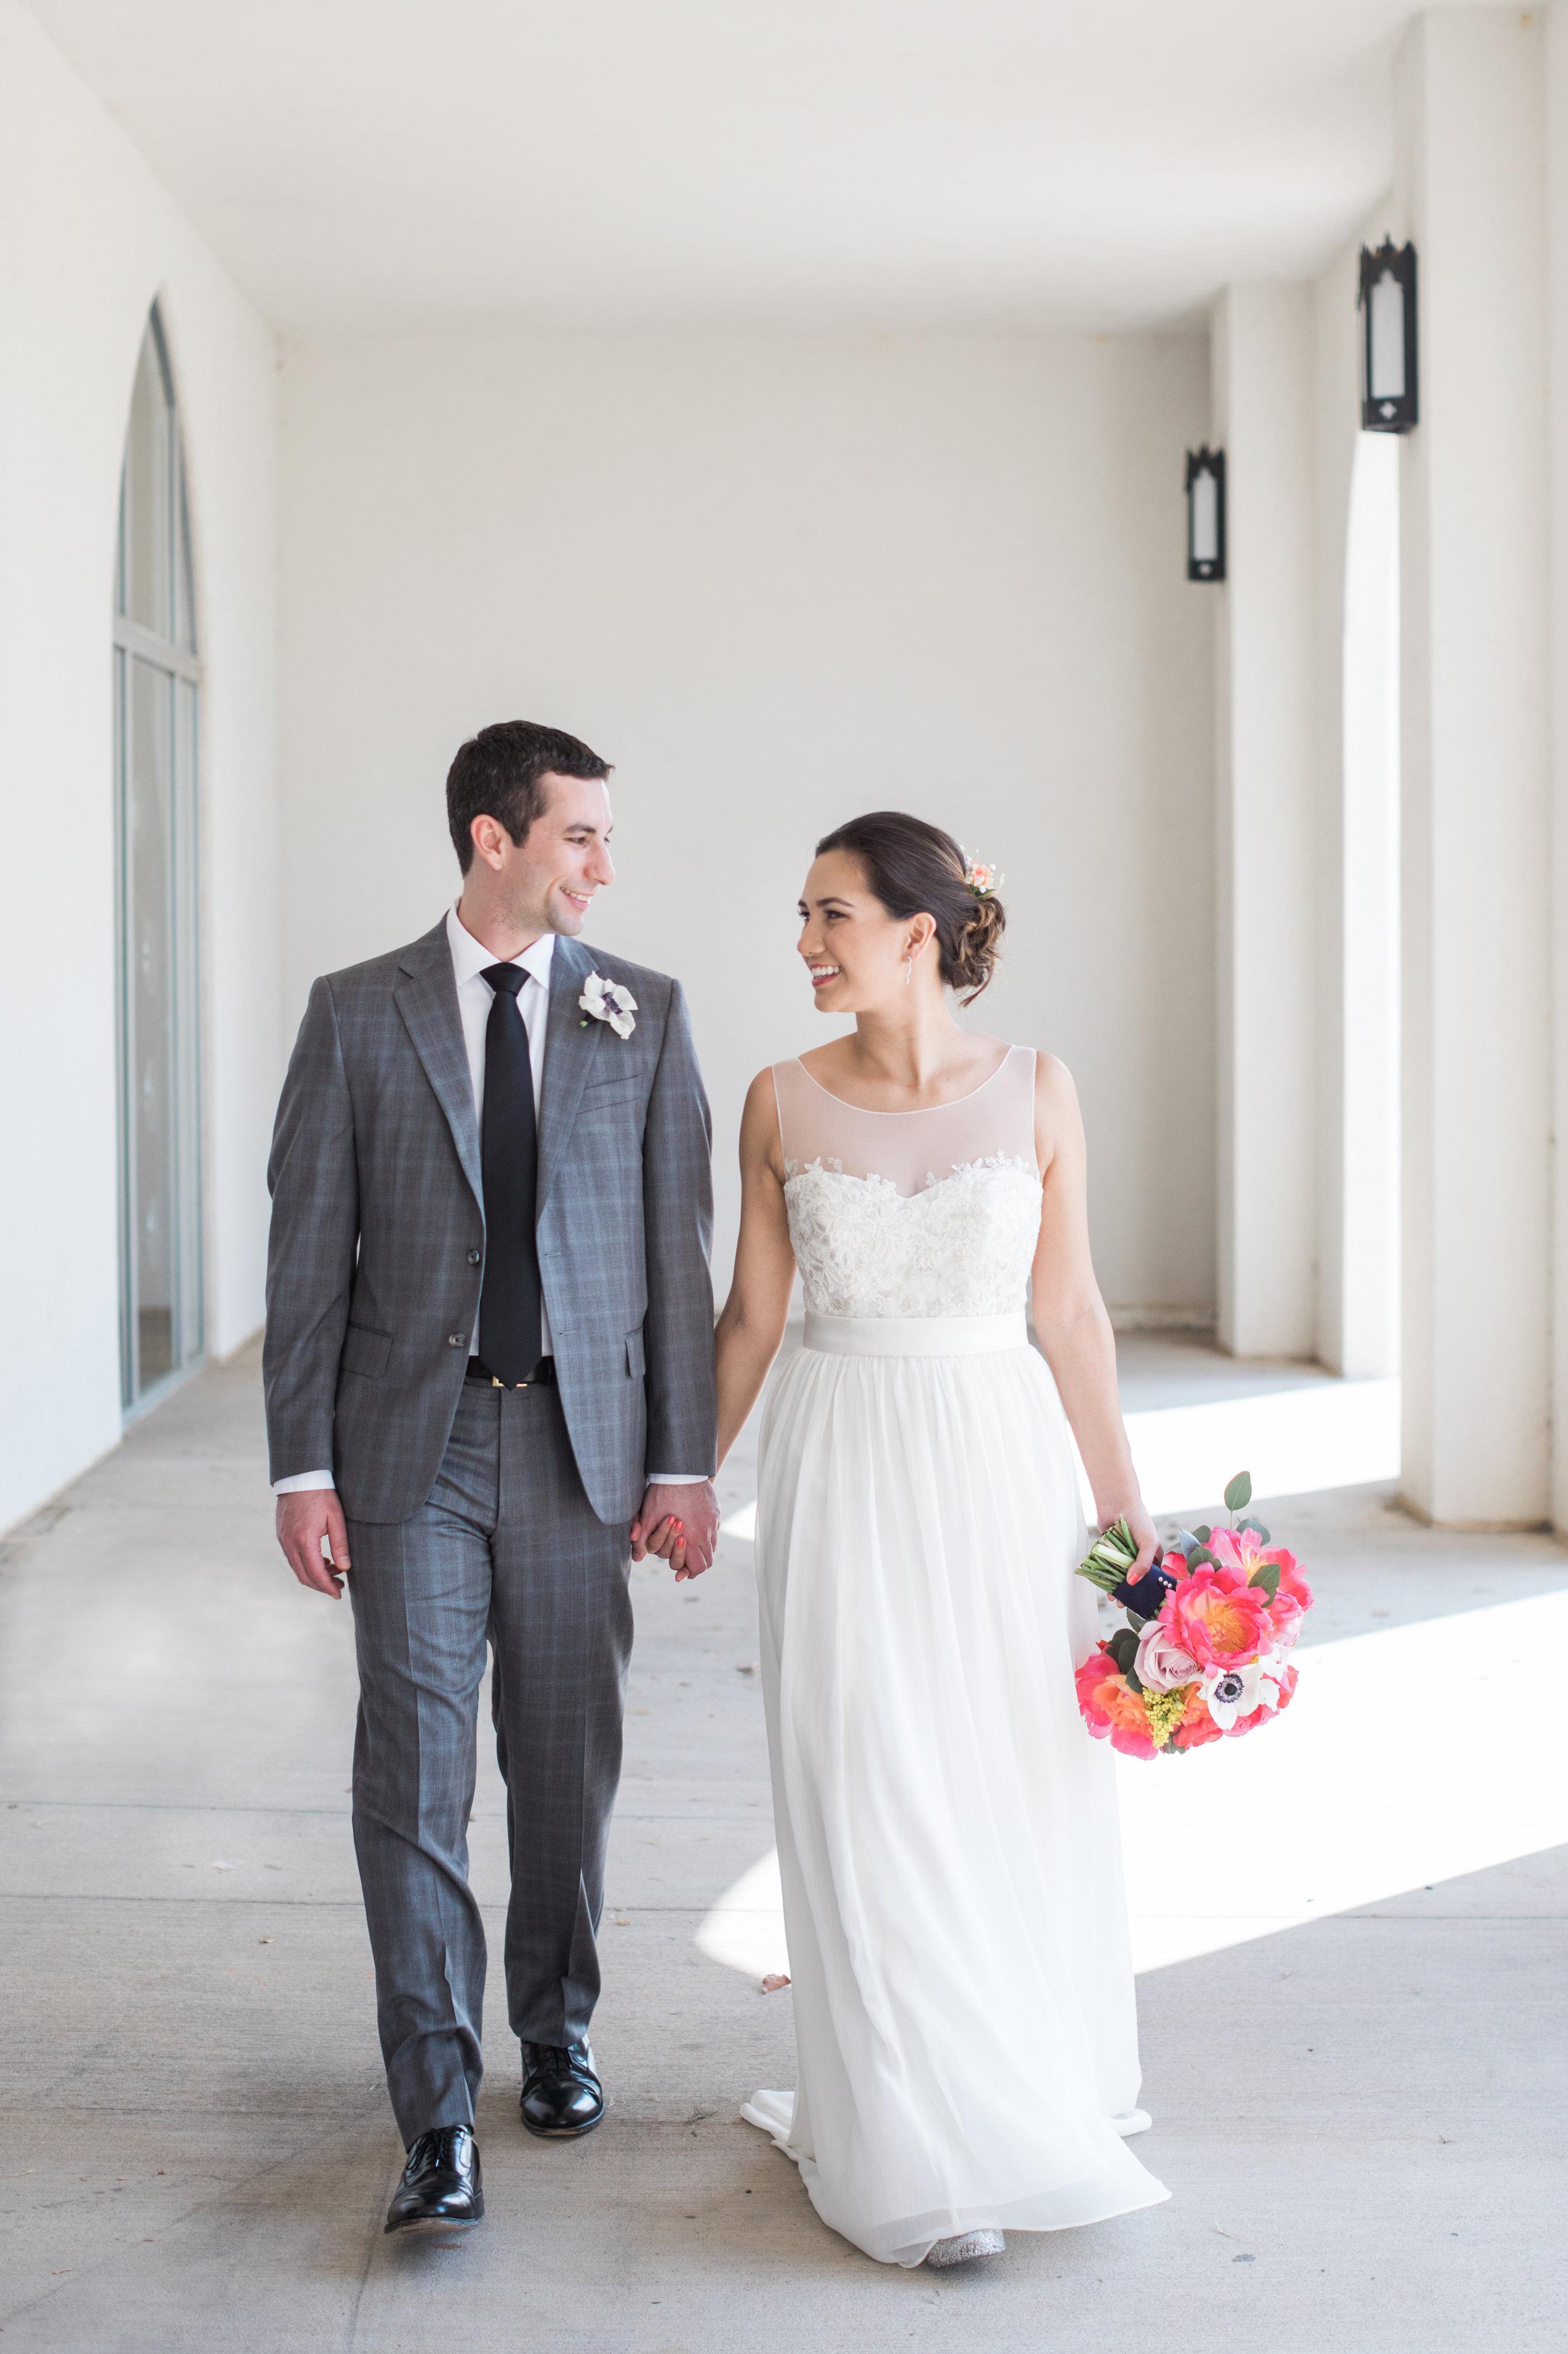 lori_adam_wedding-80.JPG